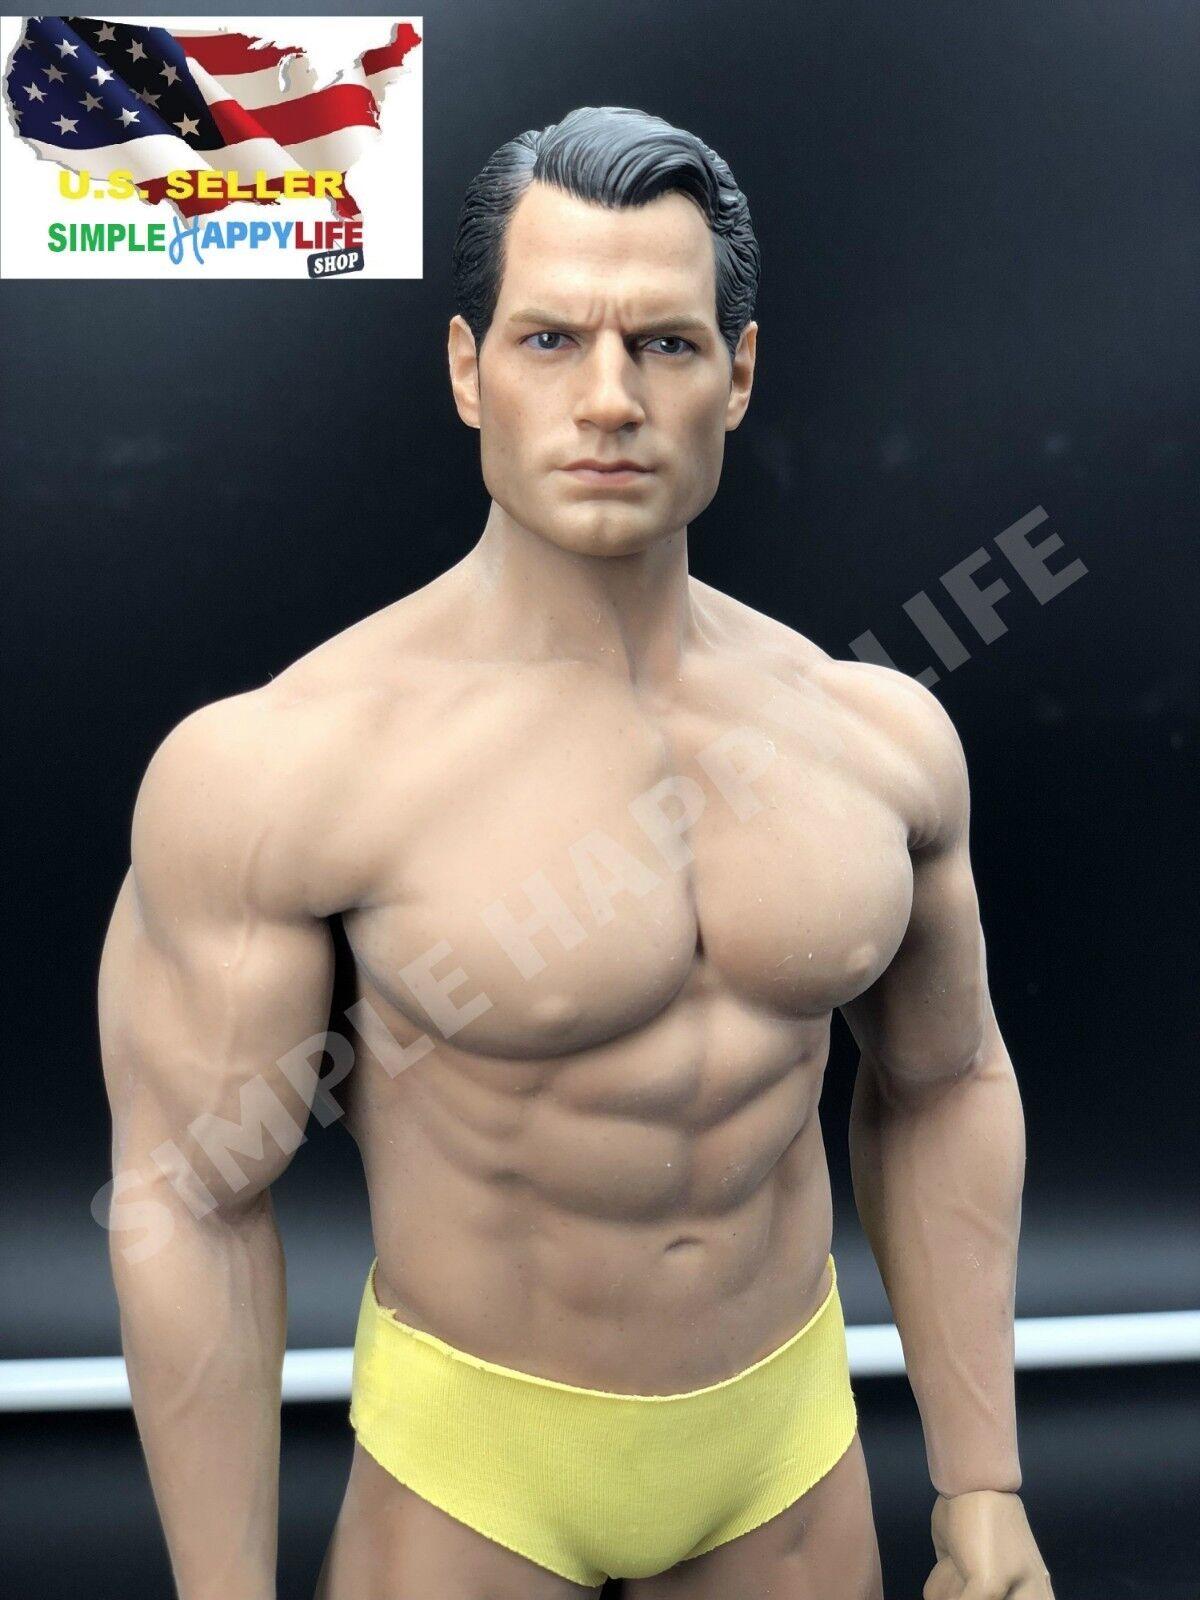 1 6 Henry Cavill súperman cabeza con Phicen Sin costuras Masculino Muscular Cuerpo M 34 ❶ USA ❶